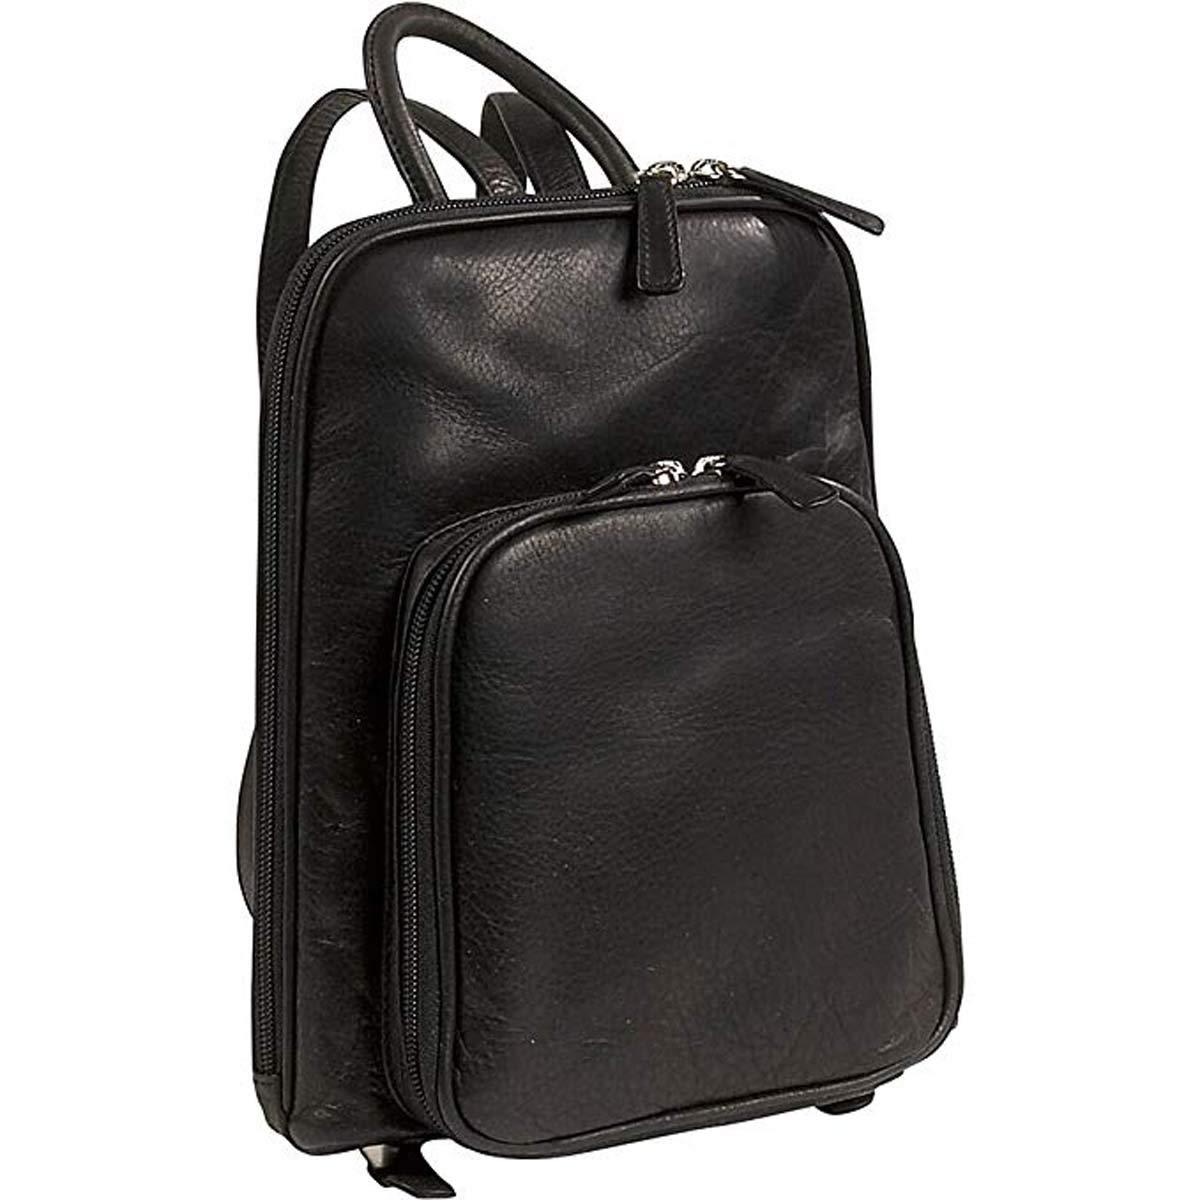 Osgoode Marley Cashmere Small Organizer Backpack (Black)